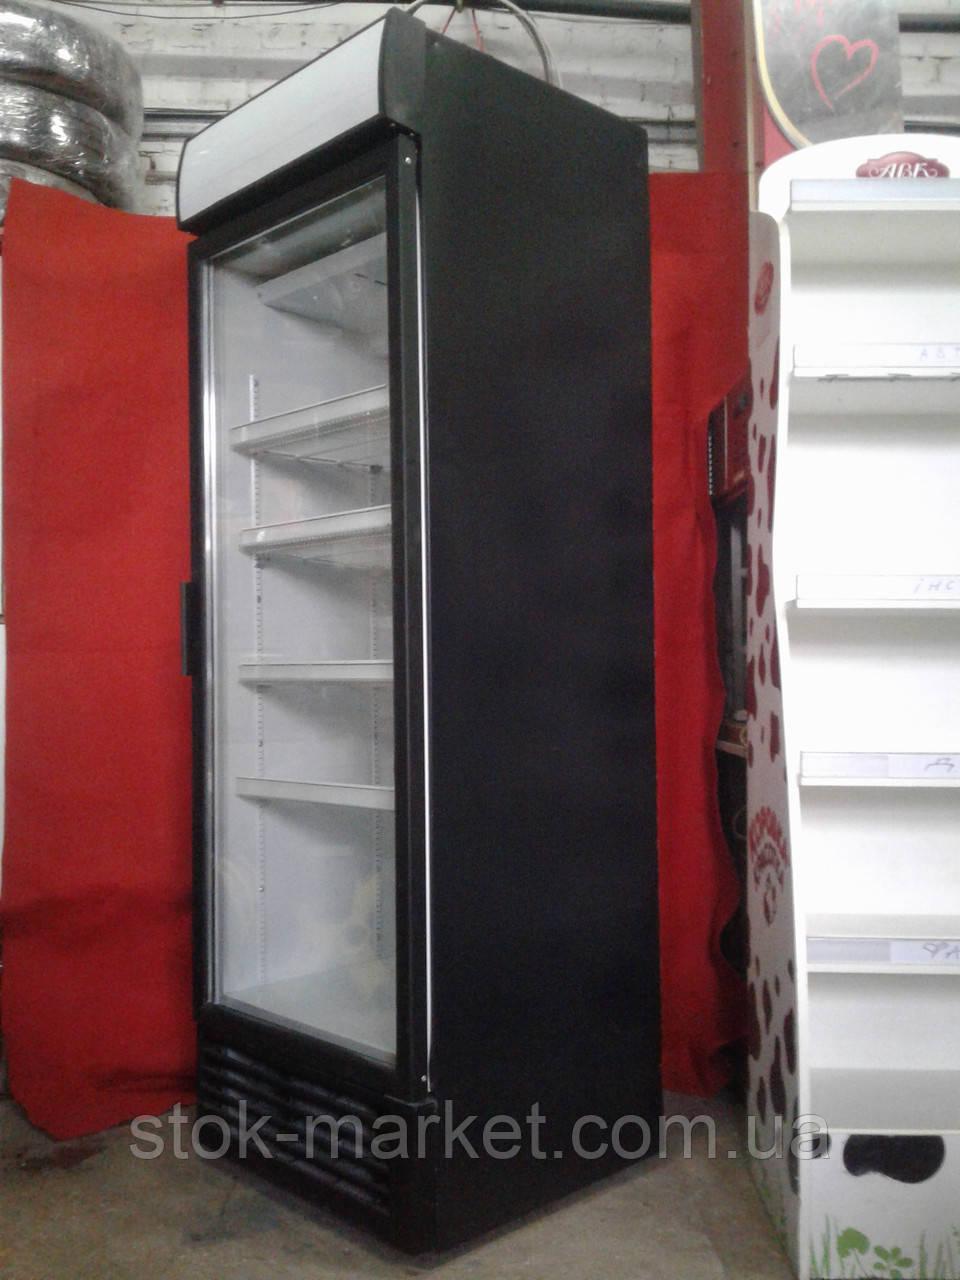 Холодильный шкаф Интер 400 - Т б/у, шкаф холодильный б у, холодильный шкаф витрина бу